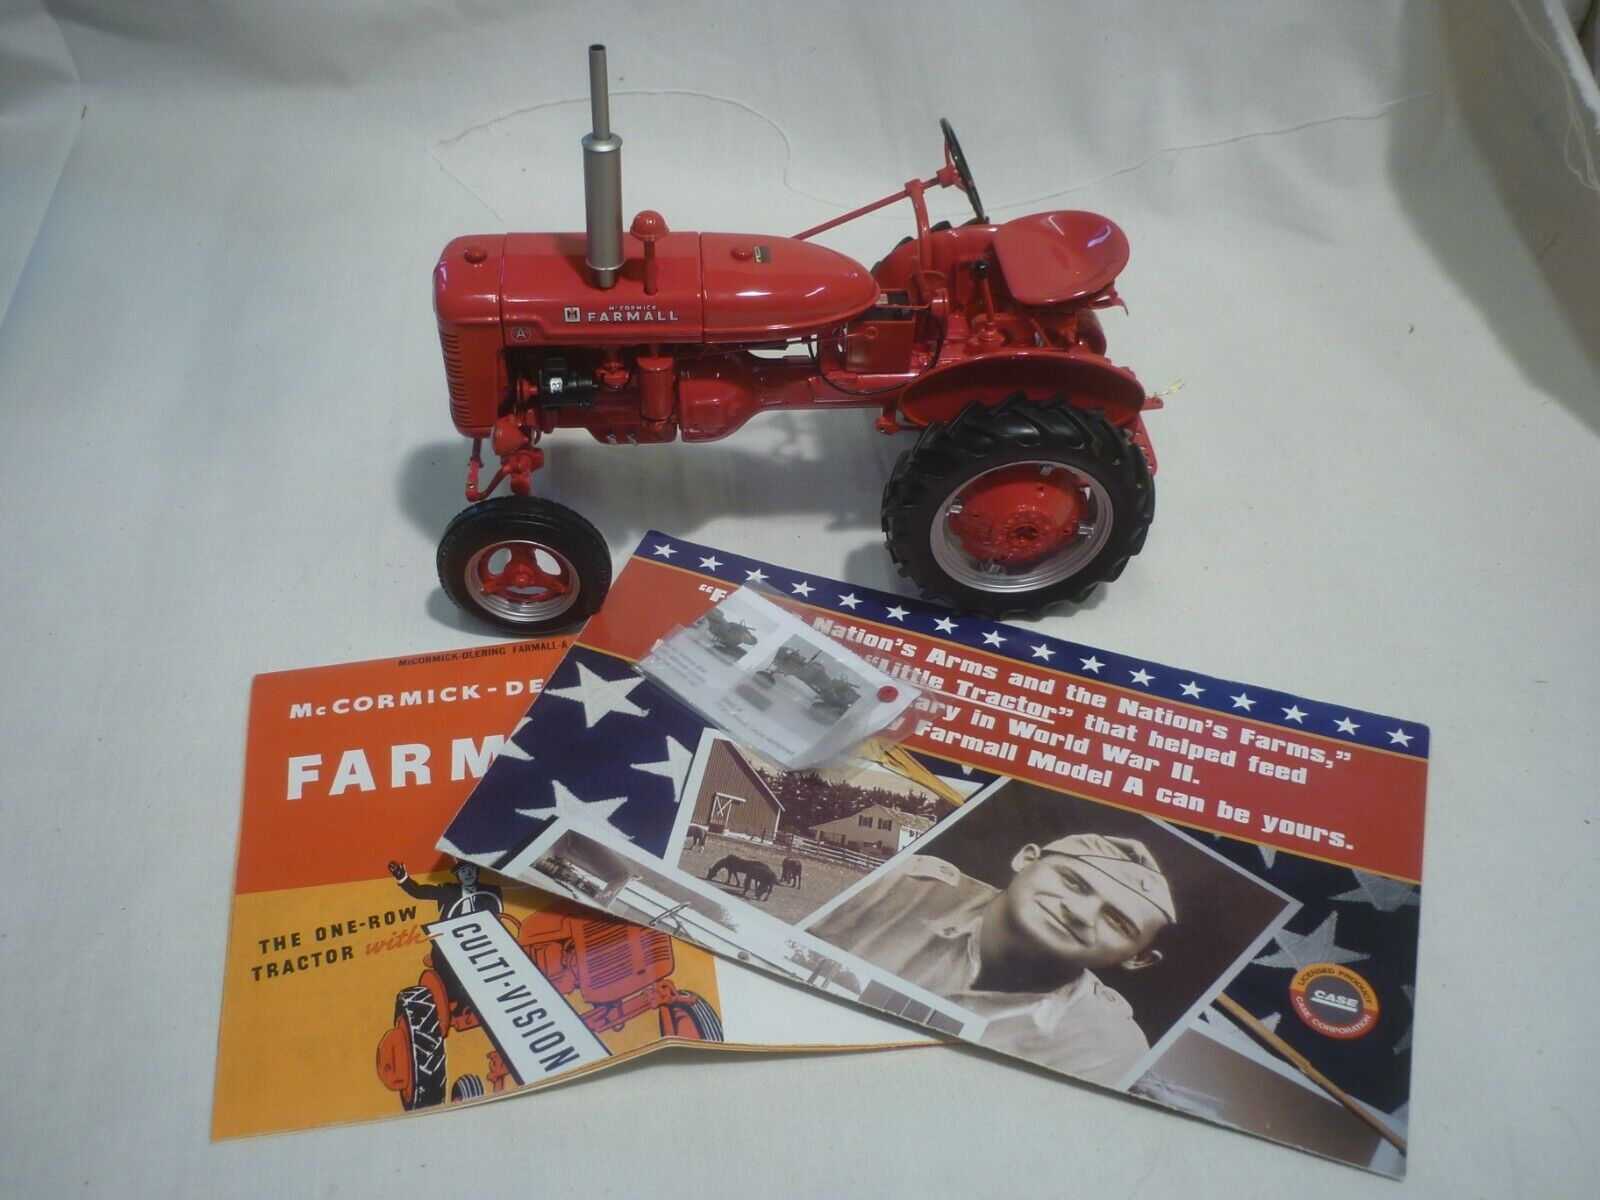 promocionales de incentivo Un Franklin Mint de un modelo a a a escala de un modelo internacional Farmall un  tiendas minoristas